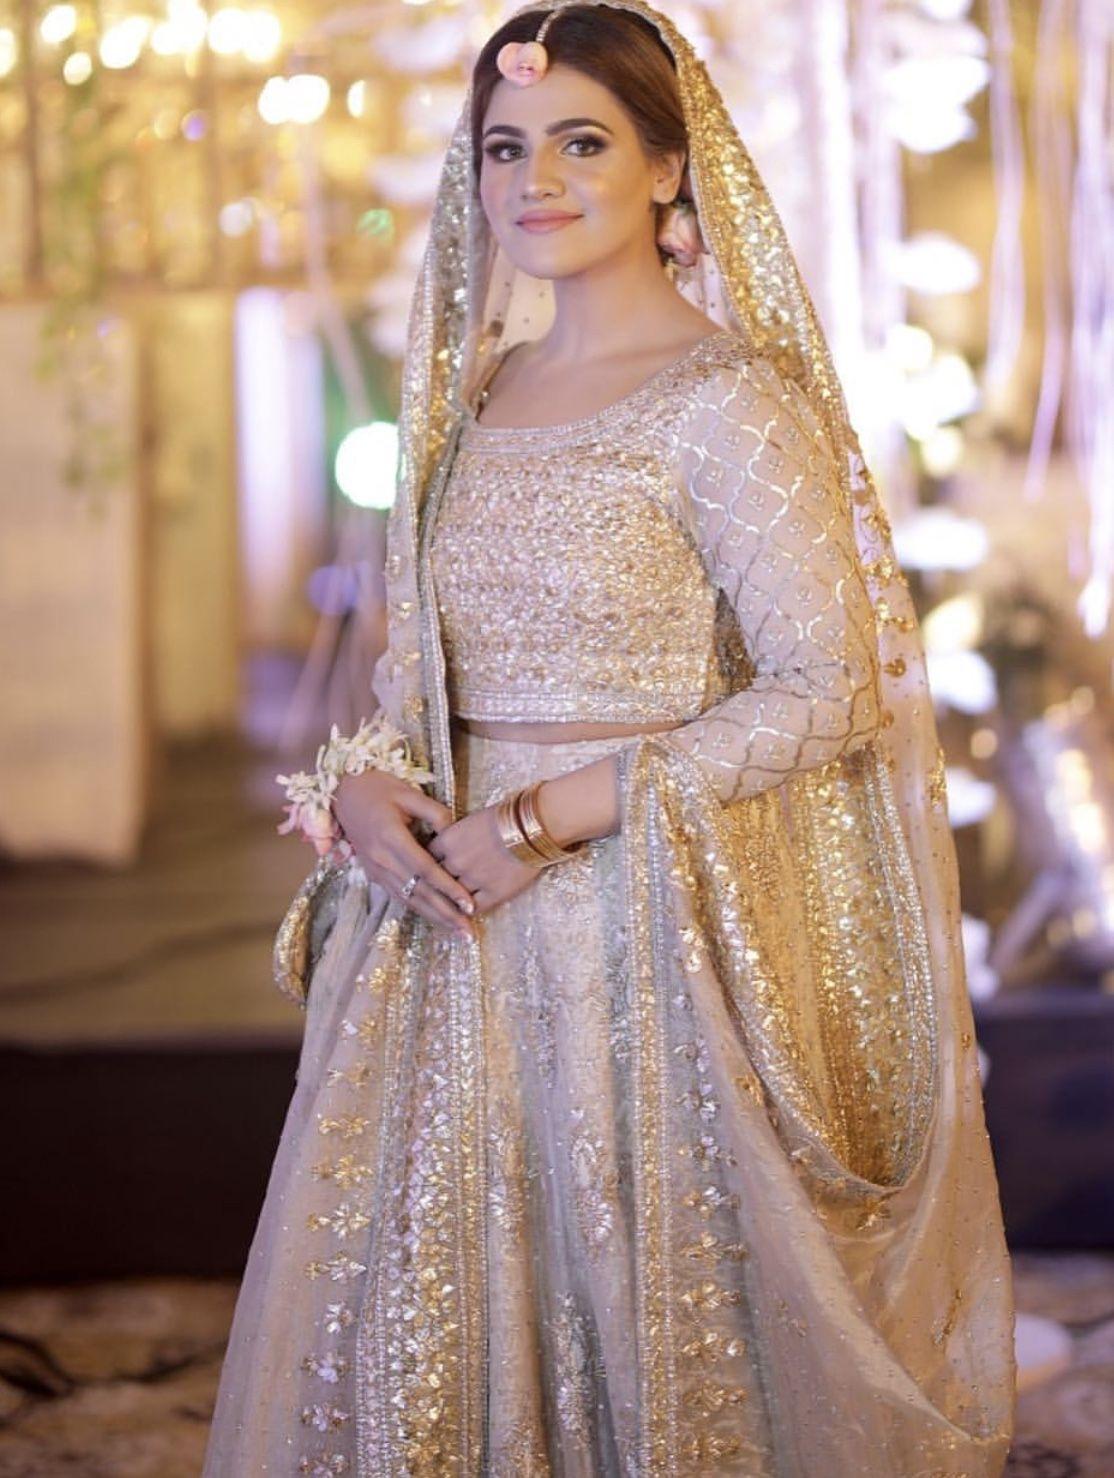 Bride At Her Milad Yes This Was Milad Not Dholki Or Nikkah Pakistani Bridal Dresses Pakistani Engagement Dresses Engagement Dresses